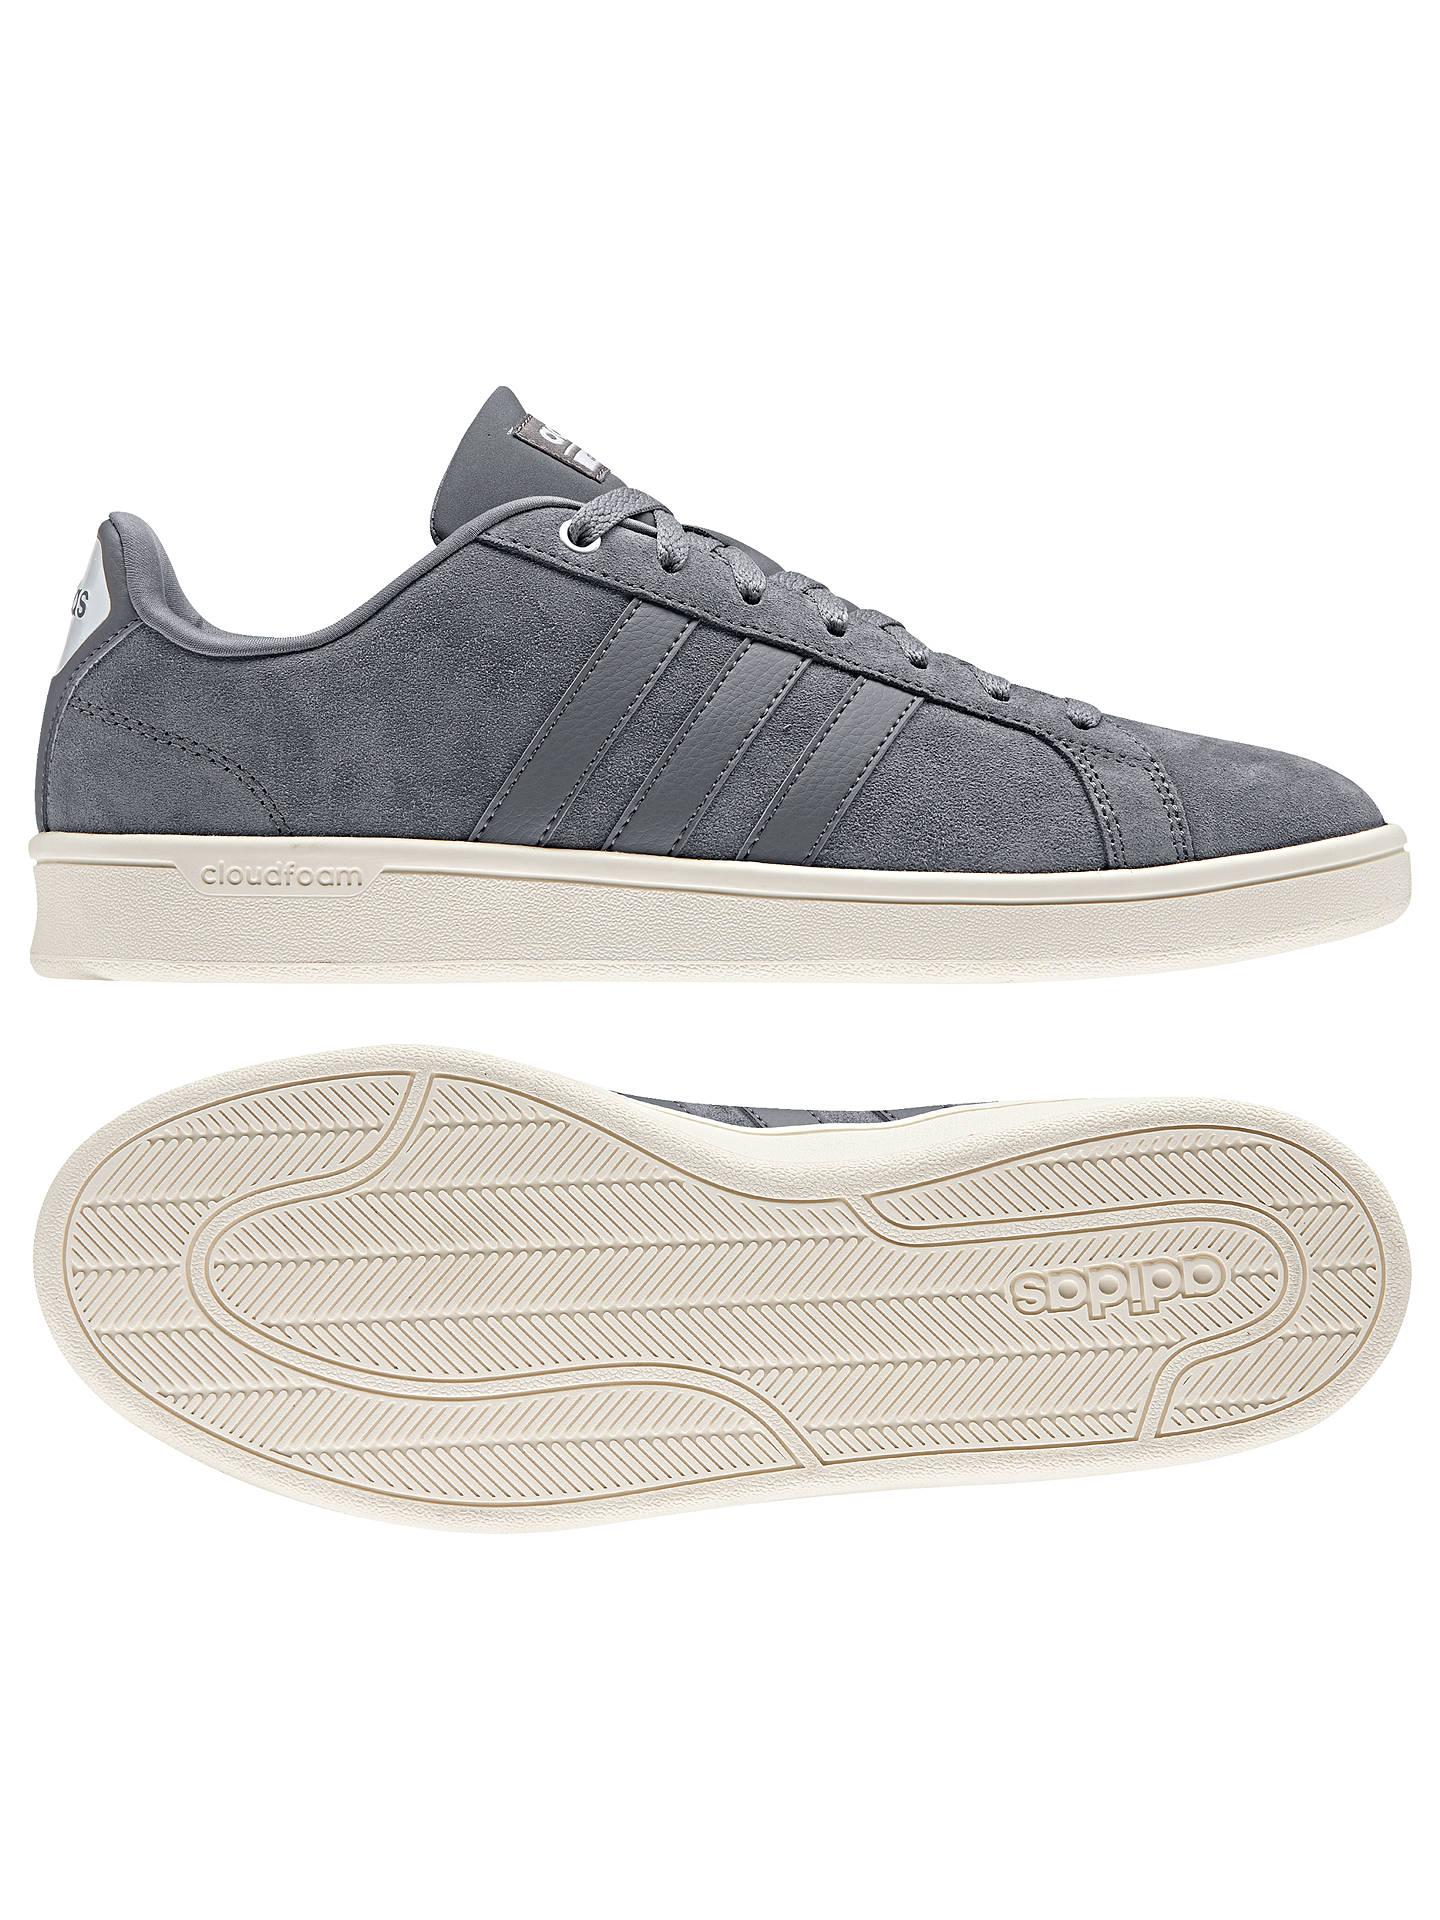 Adidas Essentials Cloudfoam Advantage Clean Online Prezzi